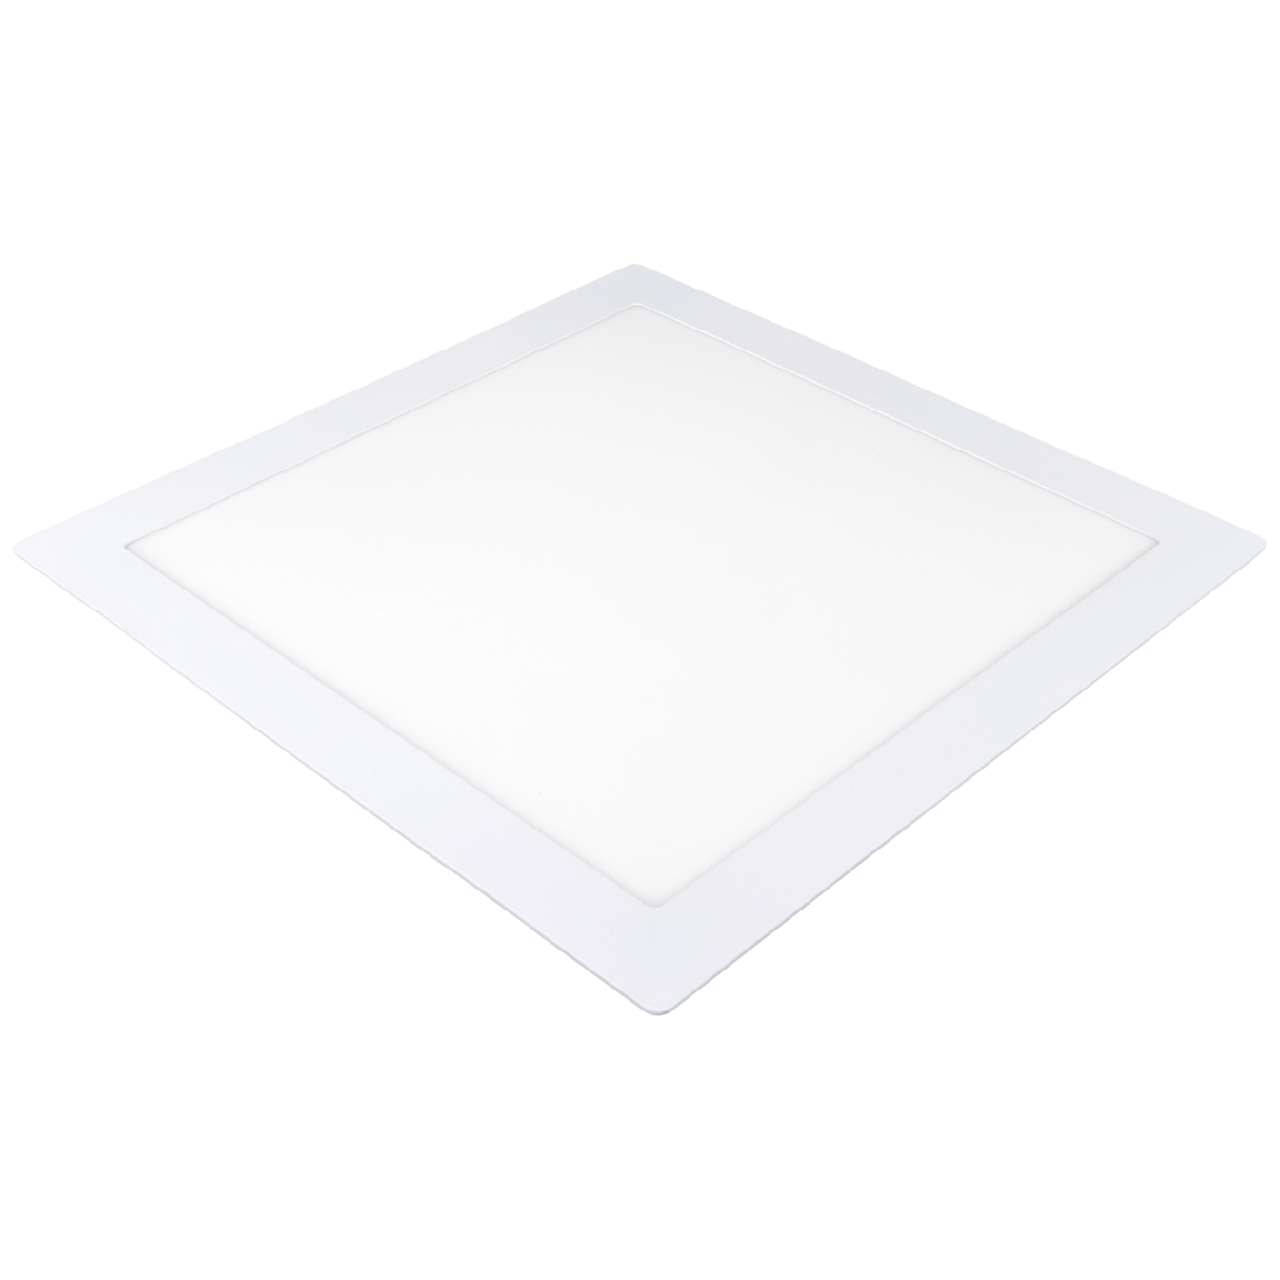 УЦ (5364) Светильник квадр. встр. Ilumia 034 RL-24-S270-NW 1900Лм, 24Вт, 295мм, 4000К